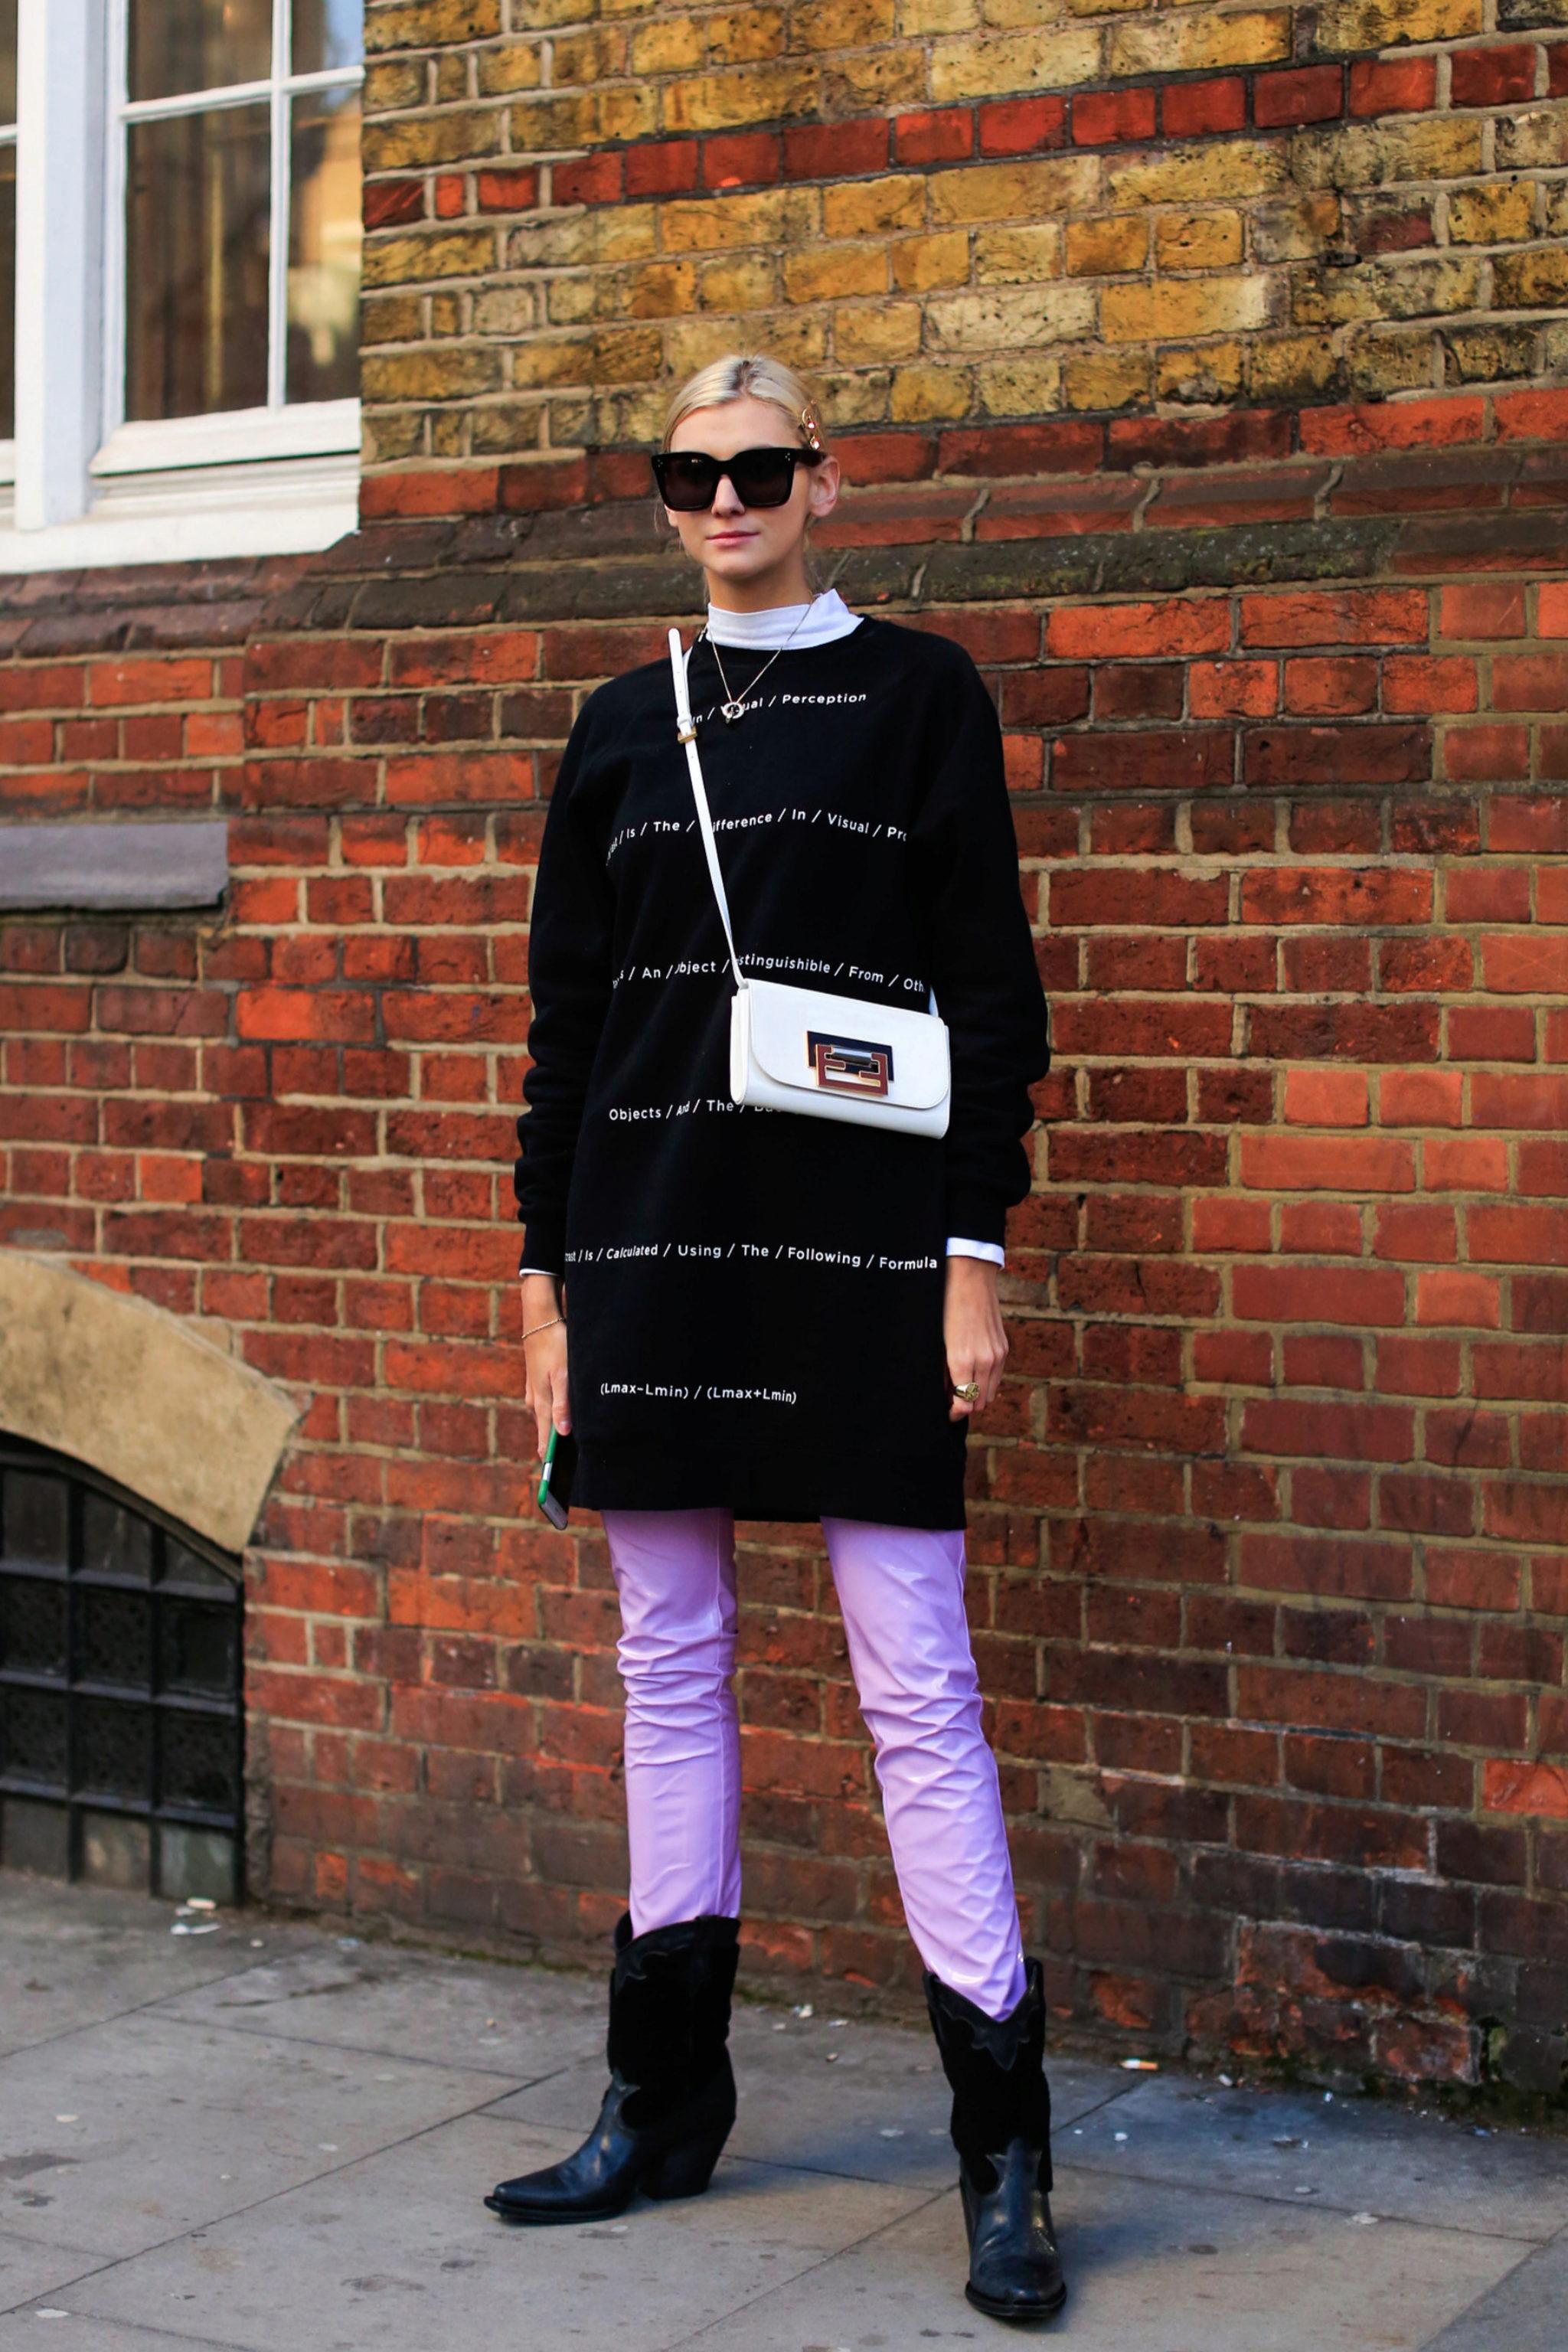 Pantalones violeta en el street style